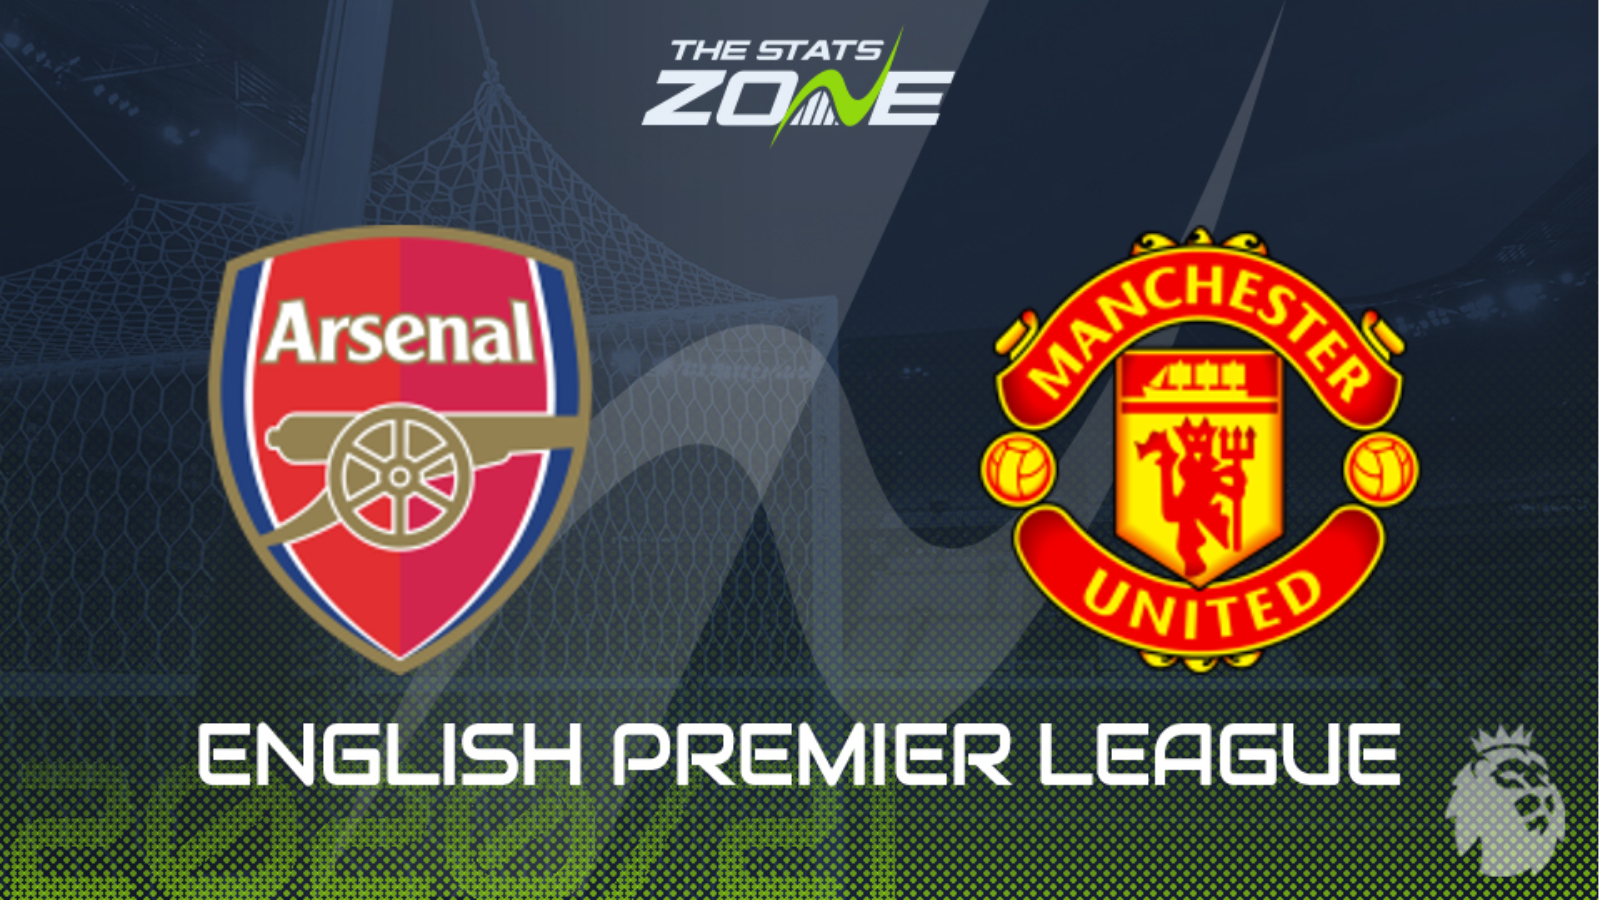 2020 21 Premier League Arsenal Vs Man Utd Preview Prediction The Stats Zone